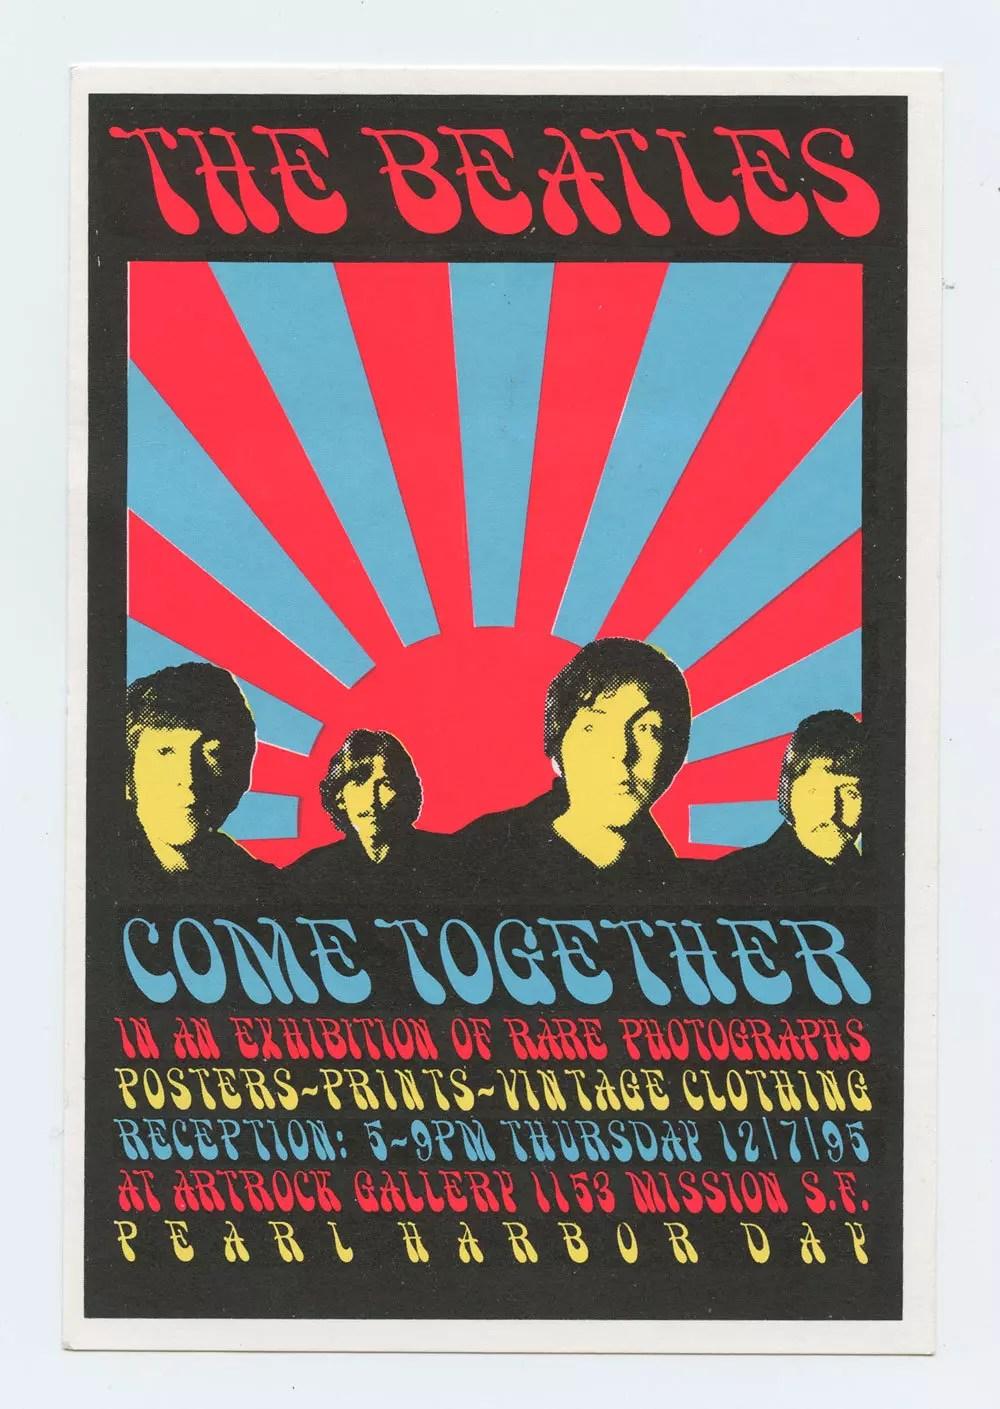 The Beatles Handbill 1995 ARTROCK gallery exhibit promotion